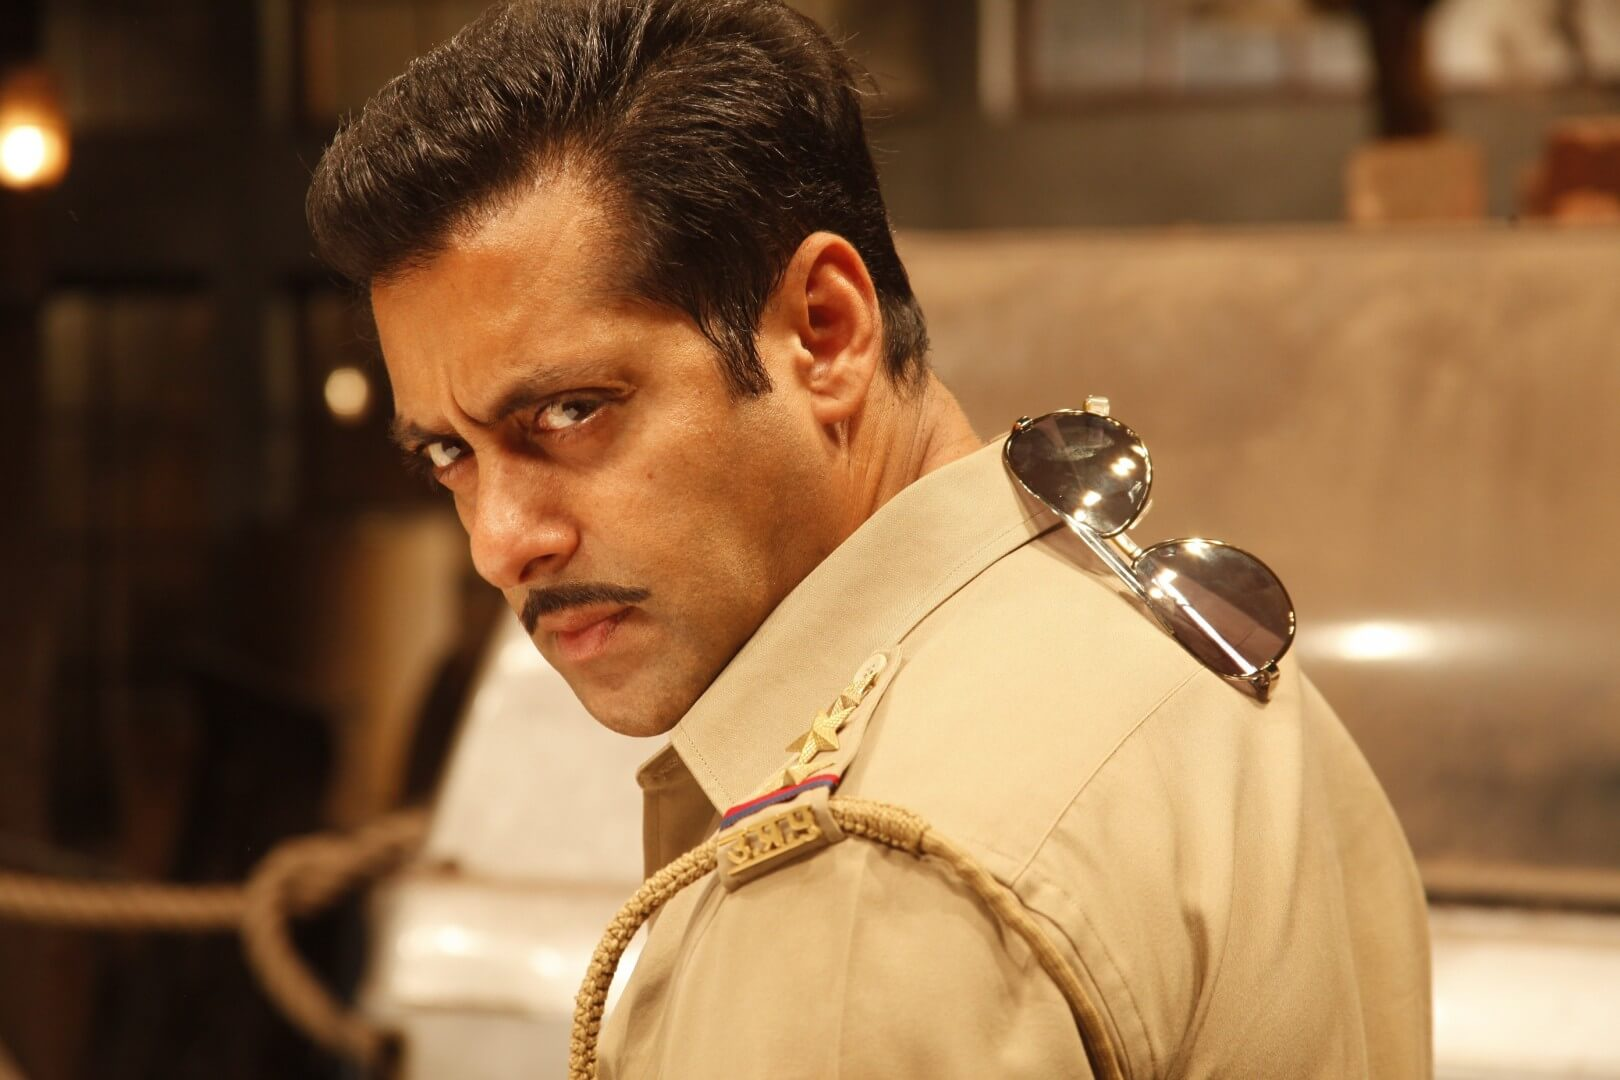 Salman Khan Photo, Age, News, Birthday, Height, Sister, Biography, Girlfriend, Awards, Address, Song, Video, Net Worth, Education, Twitter, Instagram, Facebook, Wiki, Imdb, Website, Youtube (28)